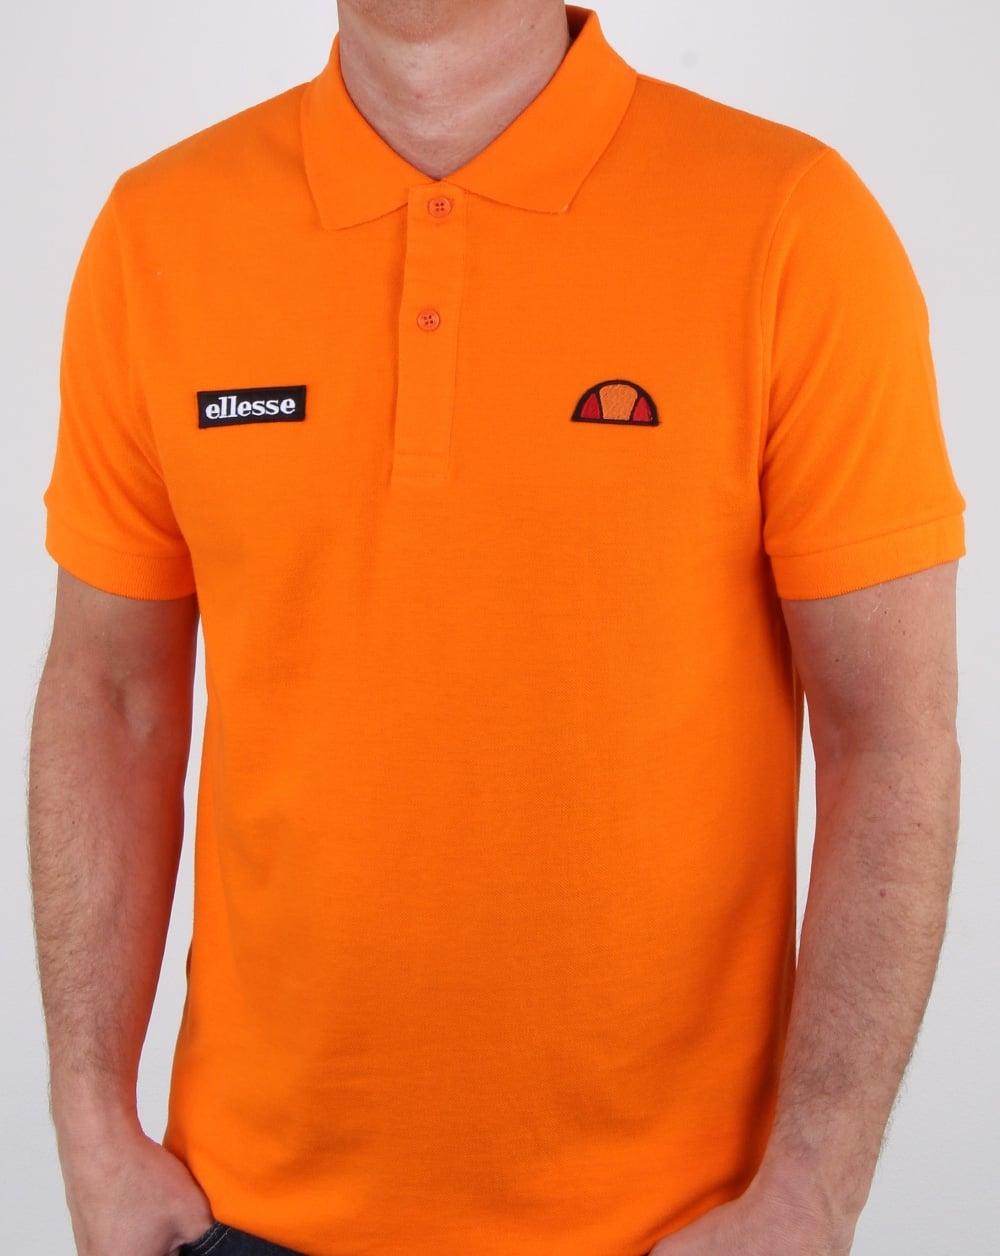 63c075b7b6e Ellesse Montura Polo Shirt Orange, Mens, Polo Shirt, Cotton, Collar